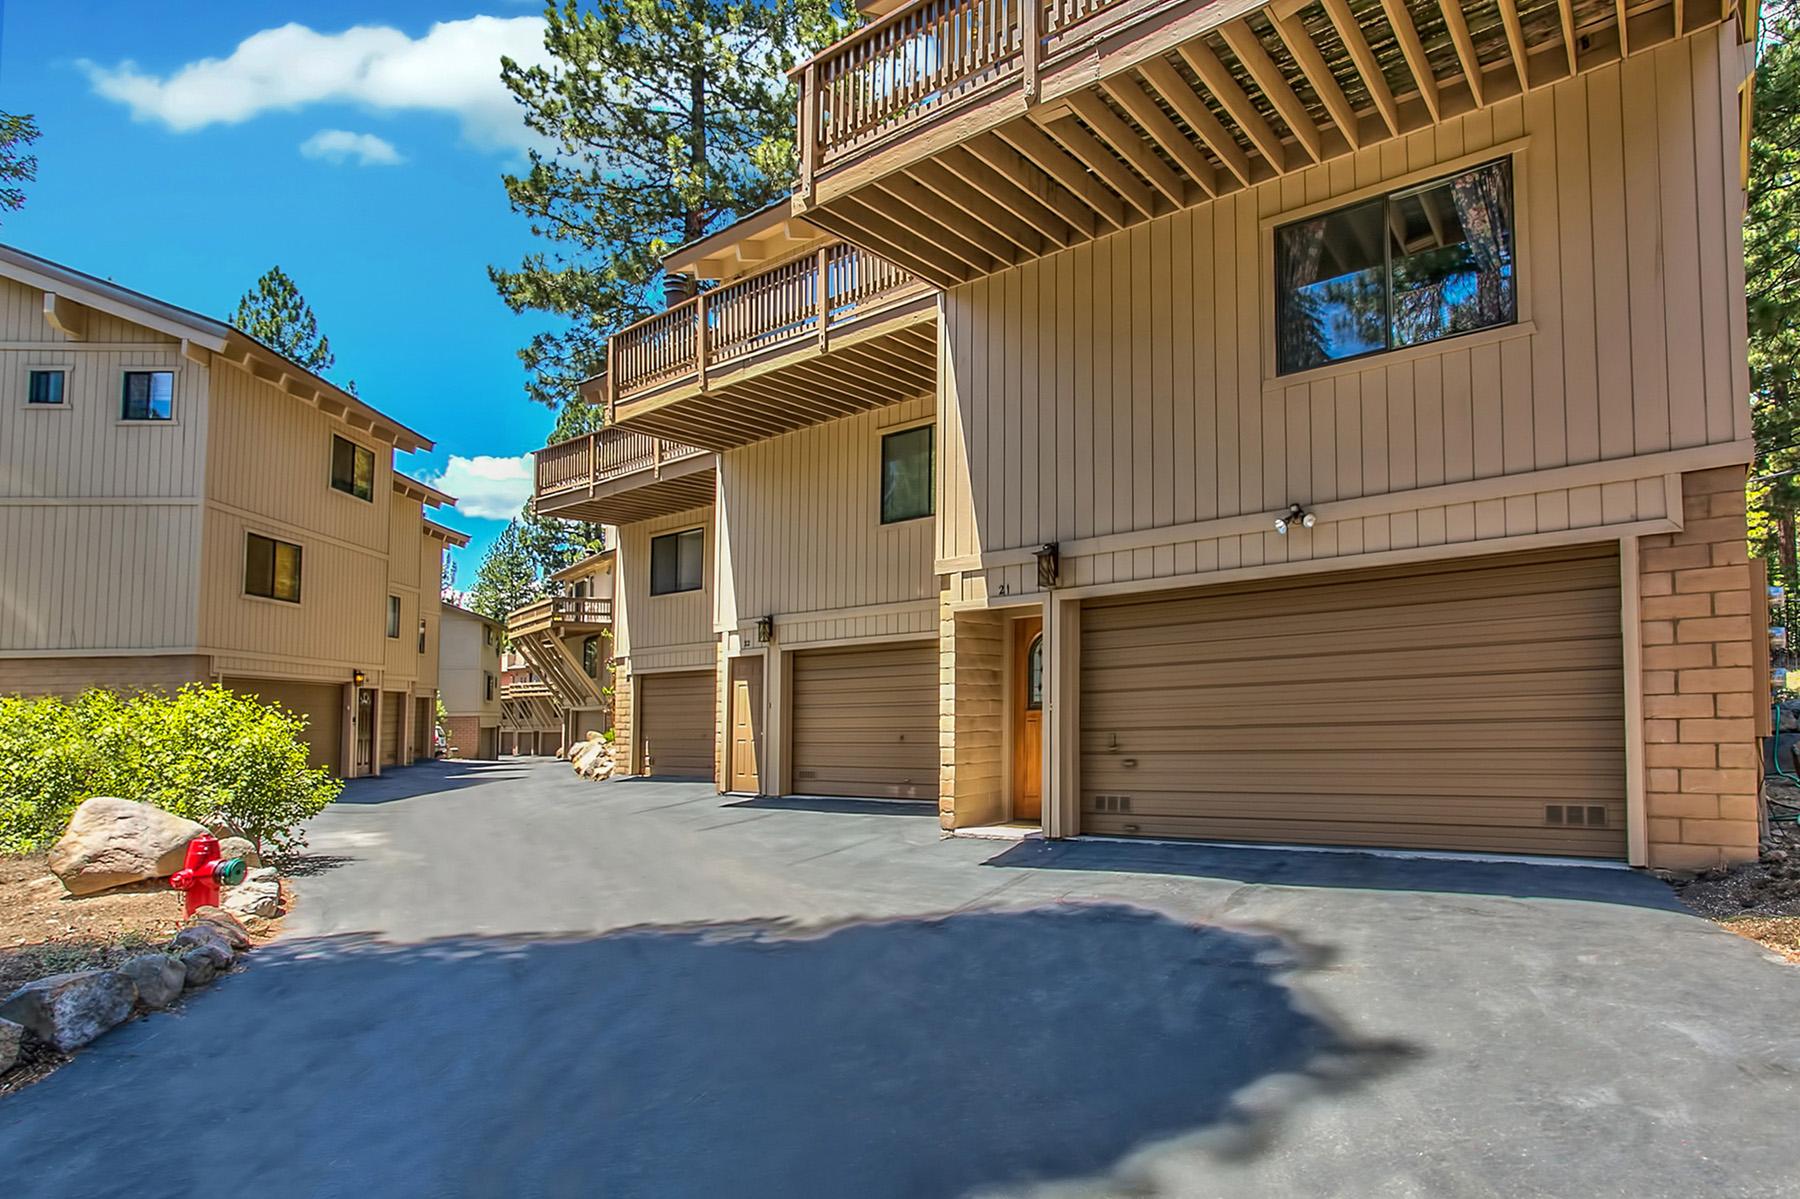 Condominium for Sale at 830 Oriole Way 830 Oriole Way Unit 21 Incline Village, Nevada 89451 United States